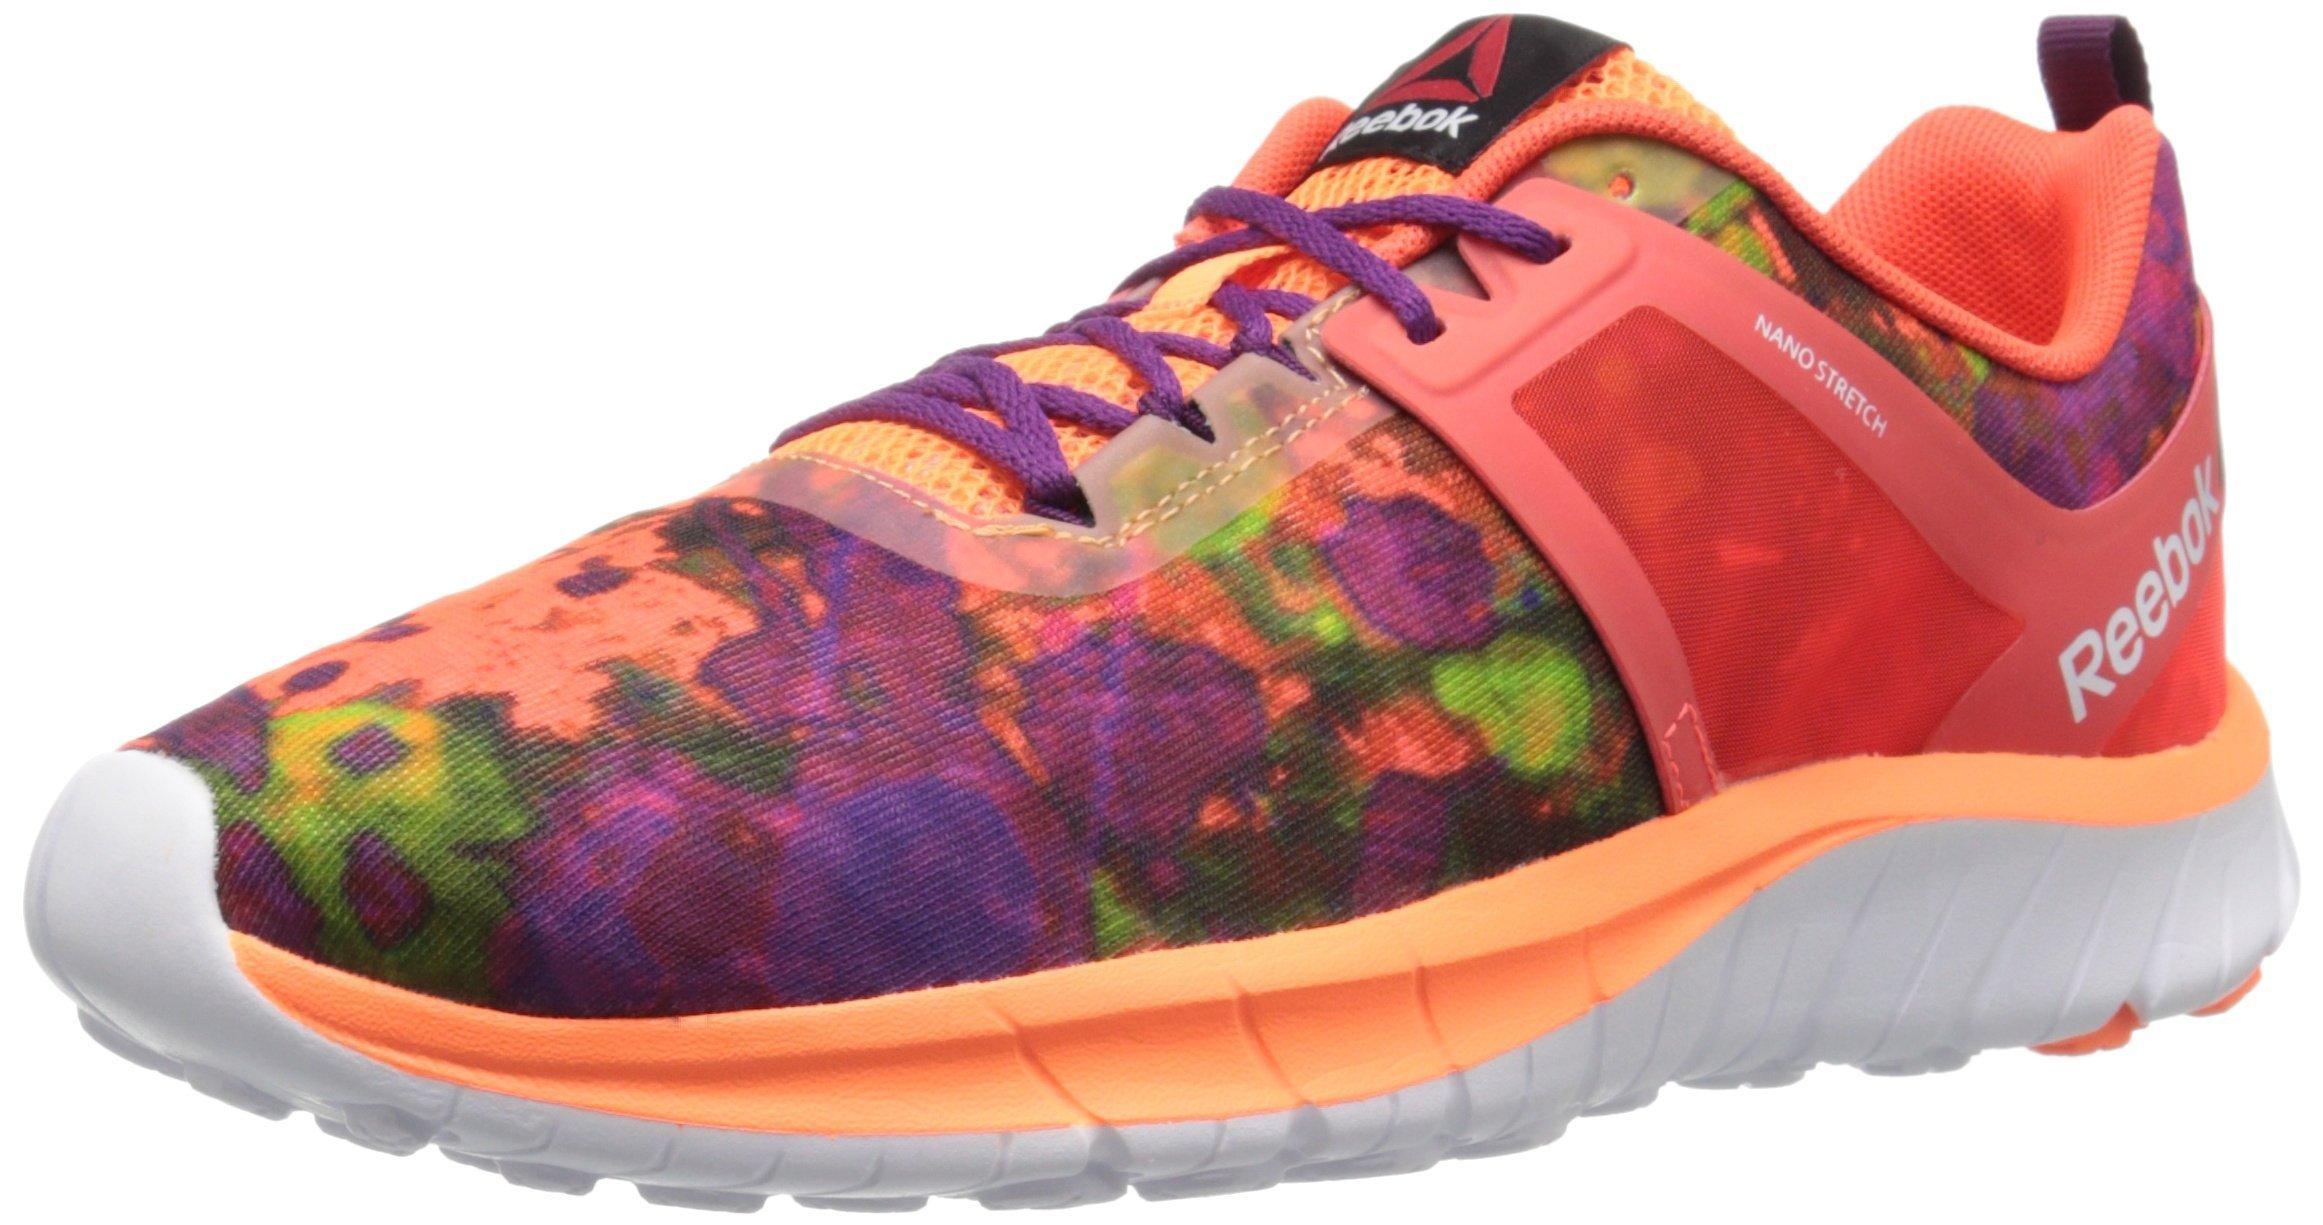 Reebok Women's Z Belle Running Shoe, Atom Red/Electric Peach/Solar Pink/Solar Yellow/Celestial Orchid, 6 M US